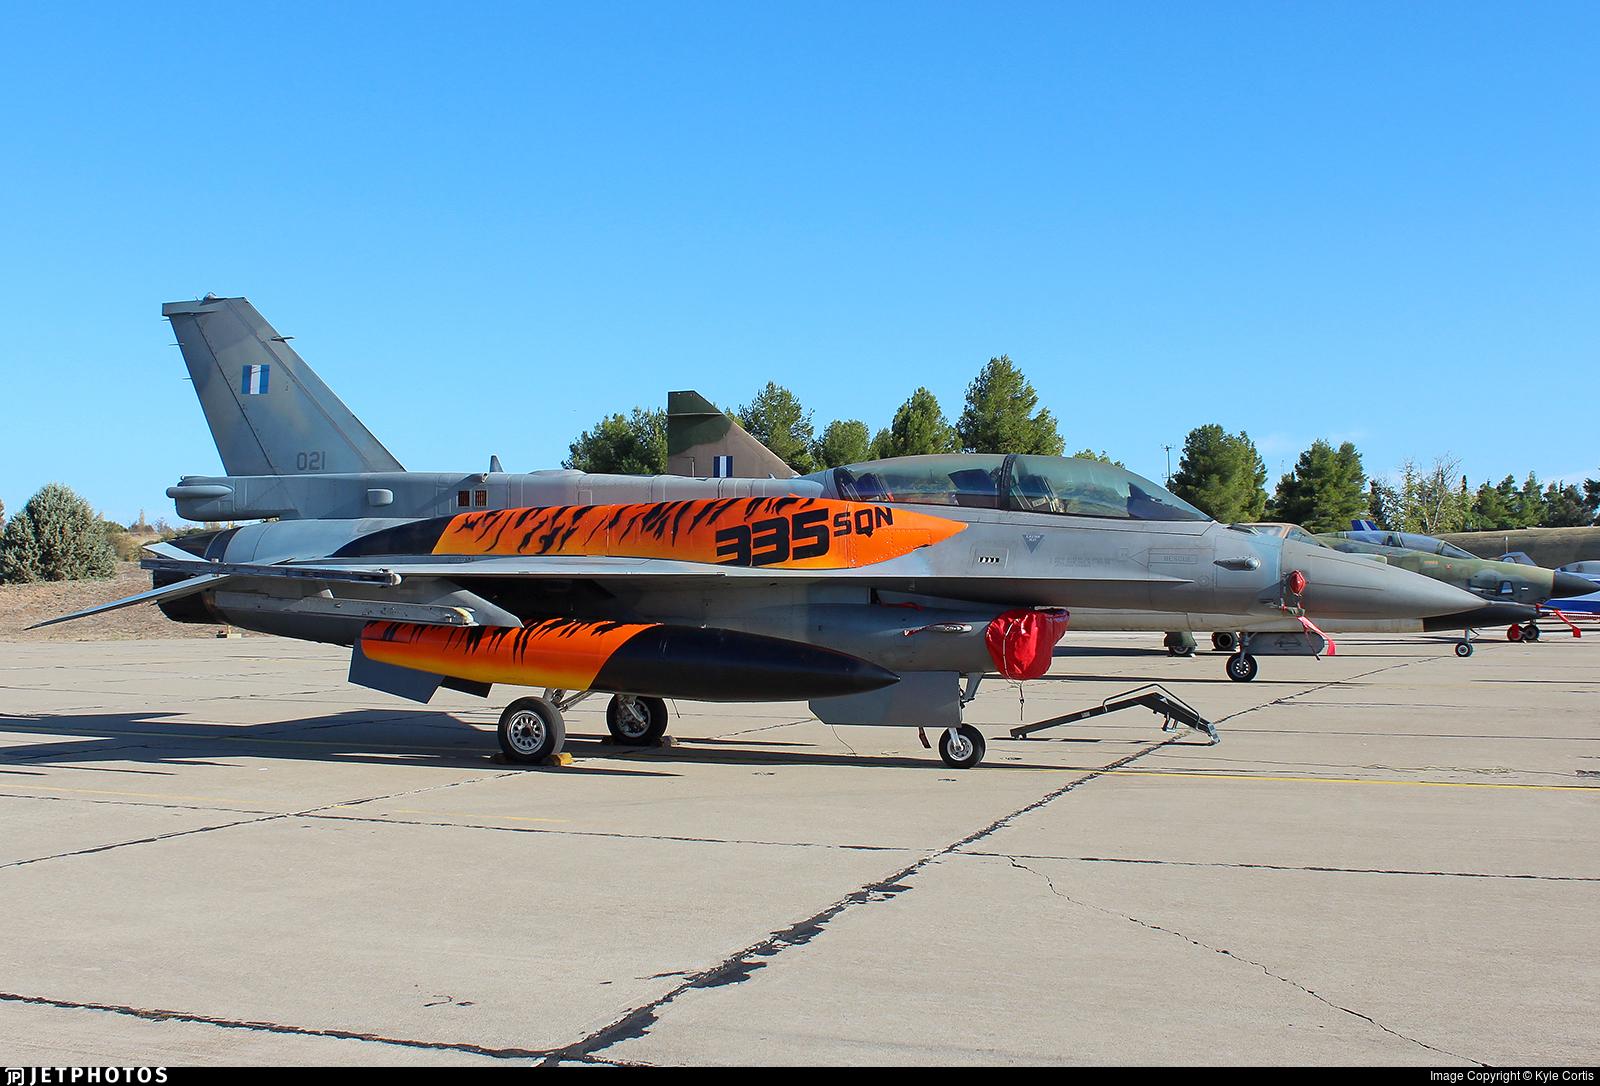 021 - Lockheed Martin F-16D Fighting Falcon - Greece - Air Force